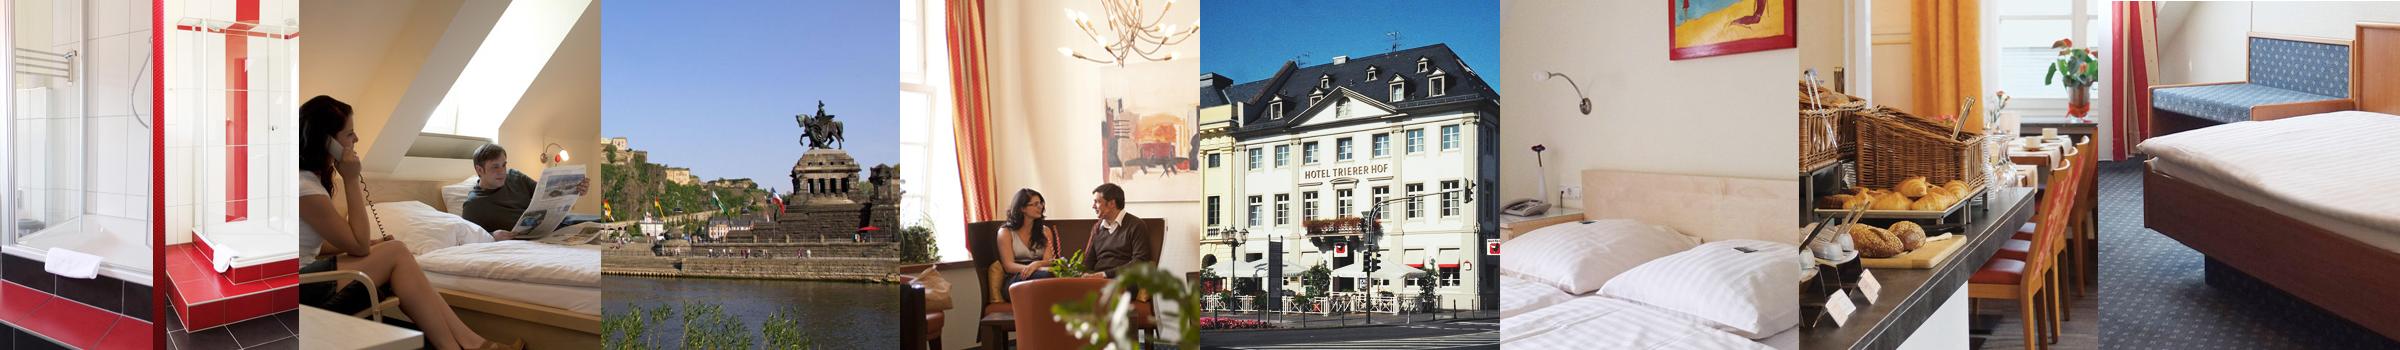 hotel-koblenz-triererhof_galerie_1-17